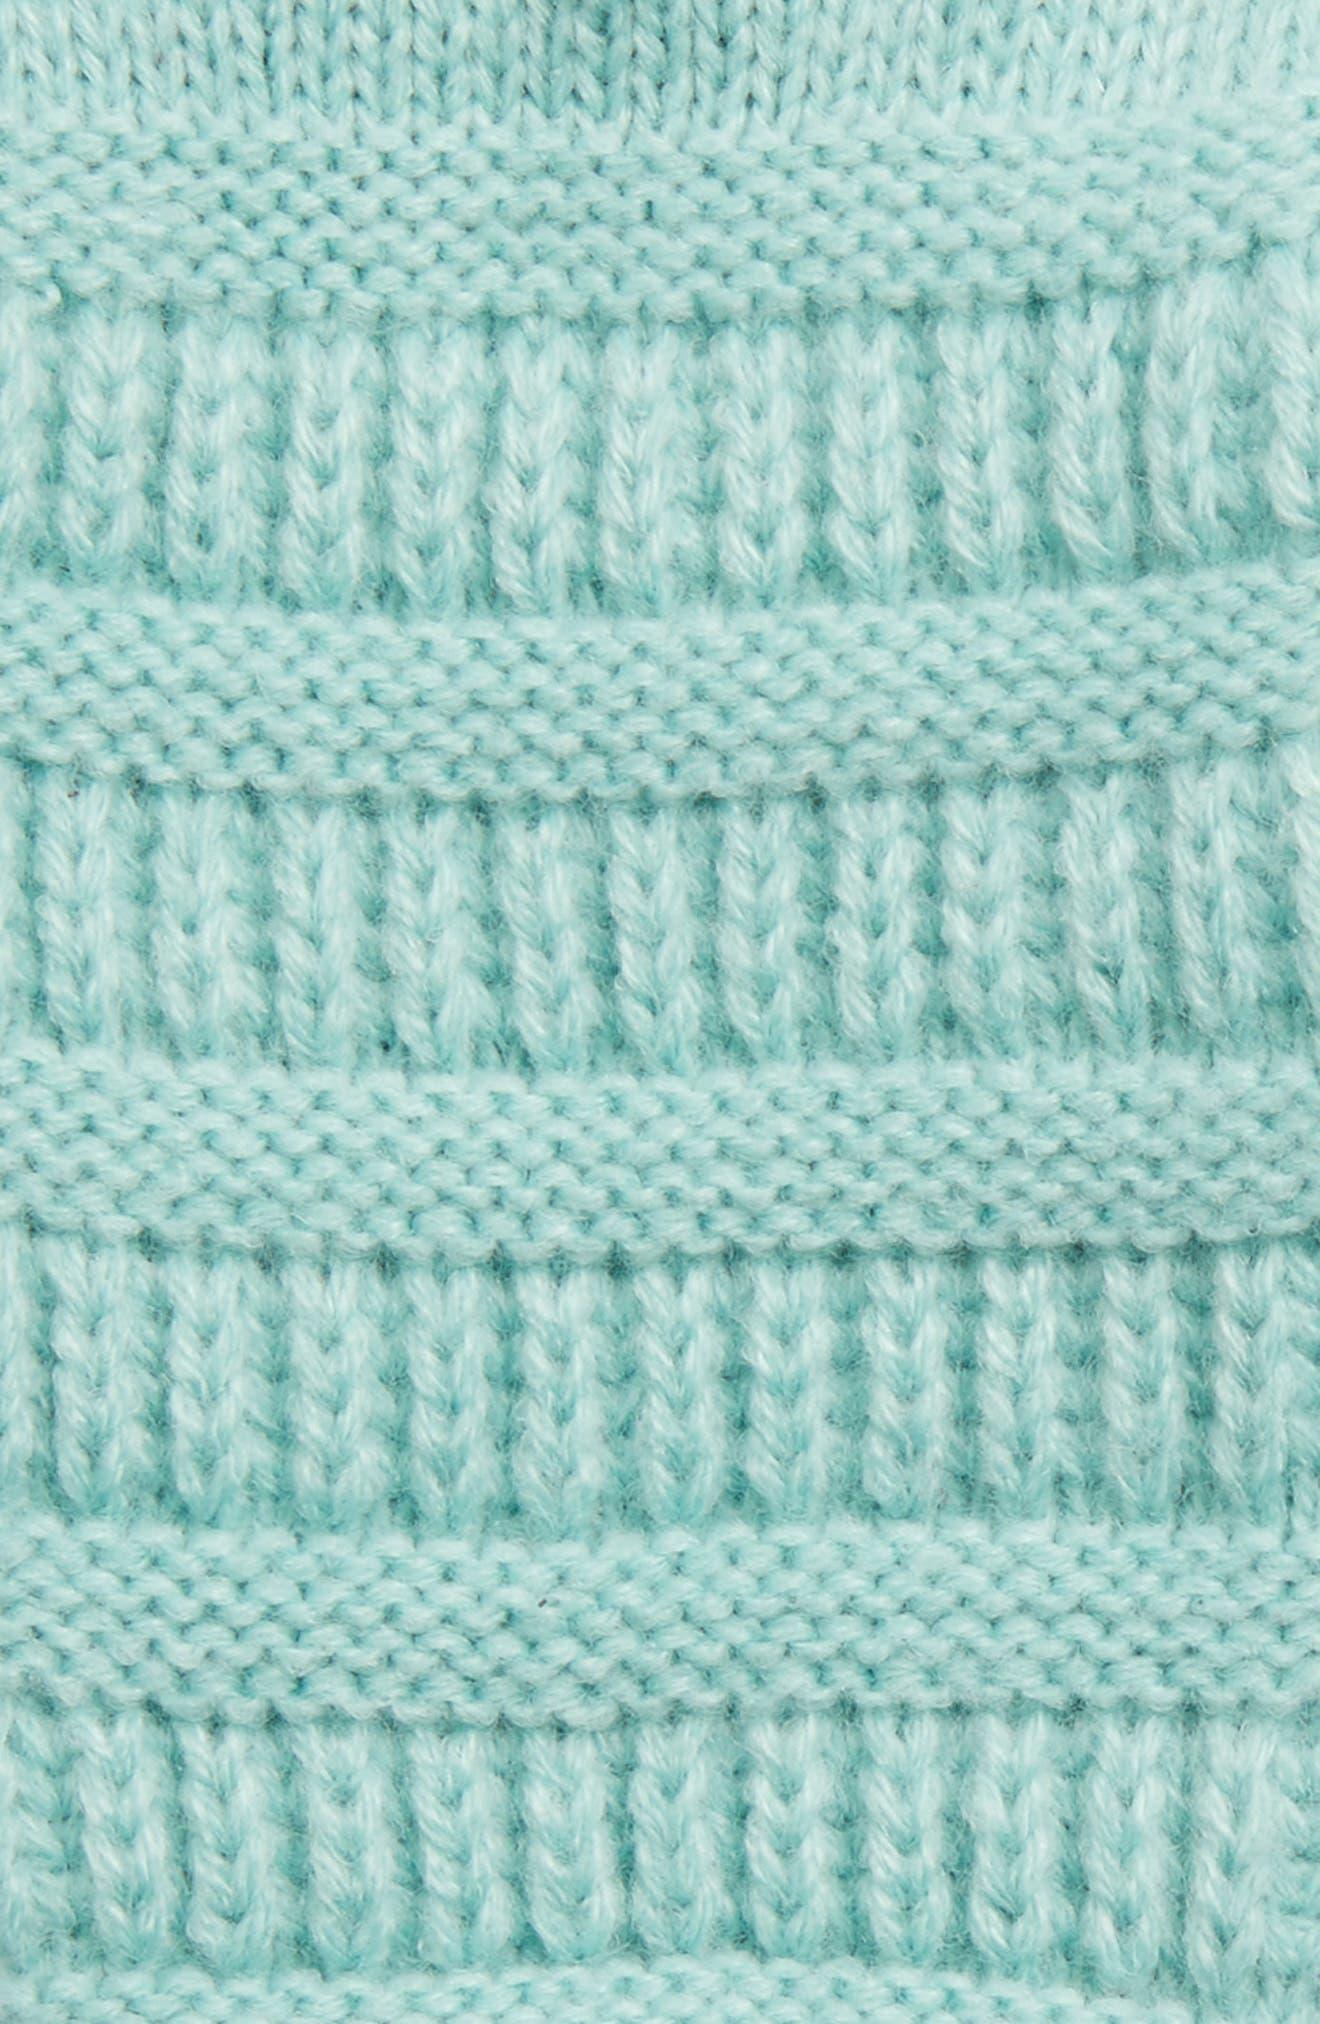 Rib Knit Tech Gloves,                             Alternate thumbnail 18, color,